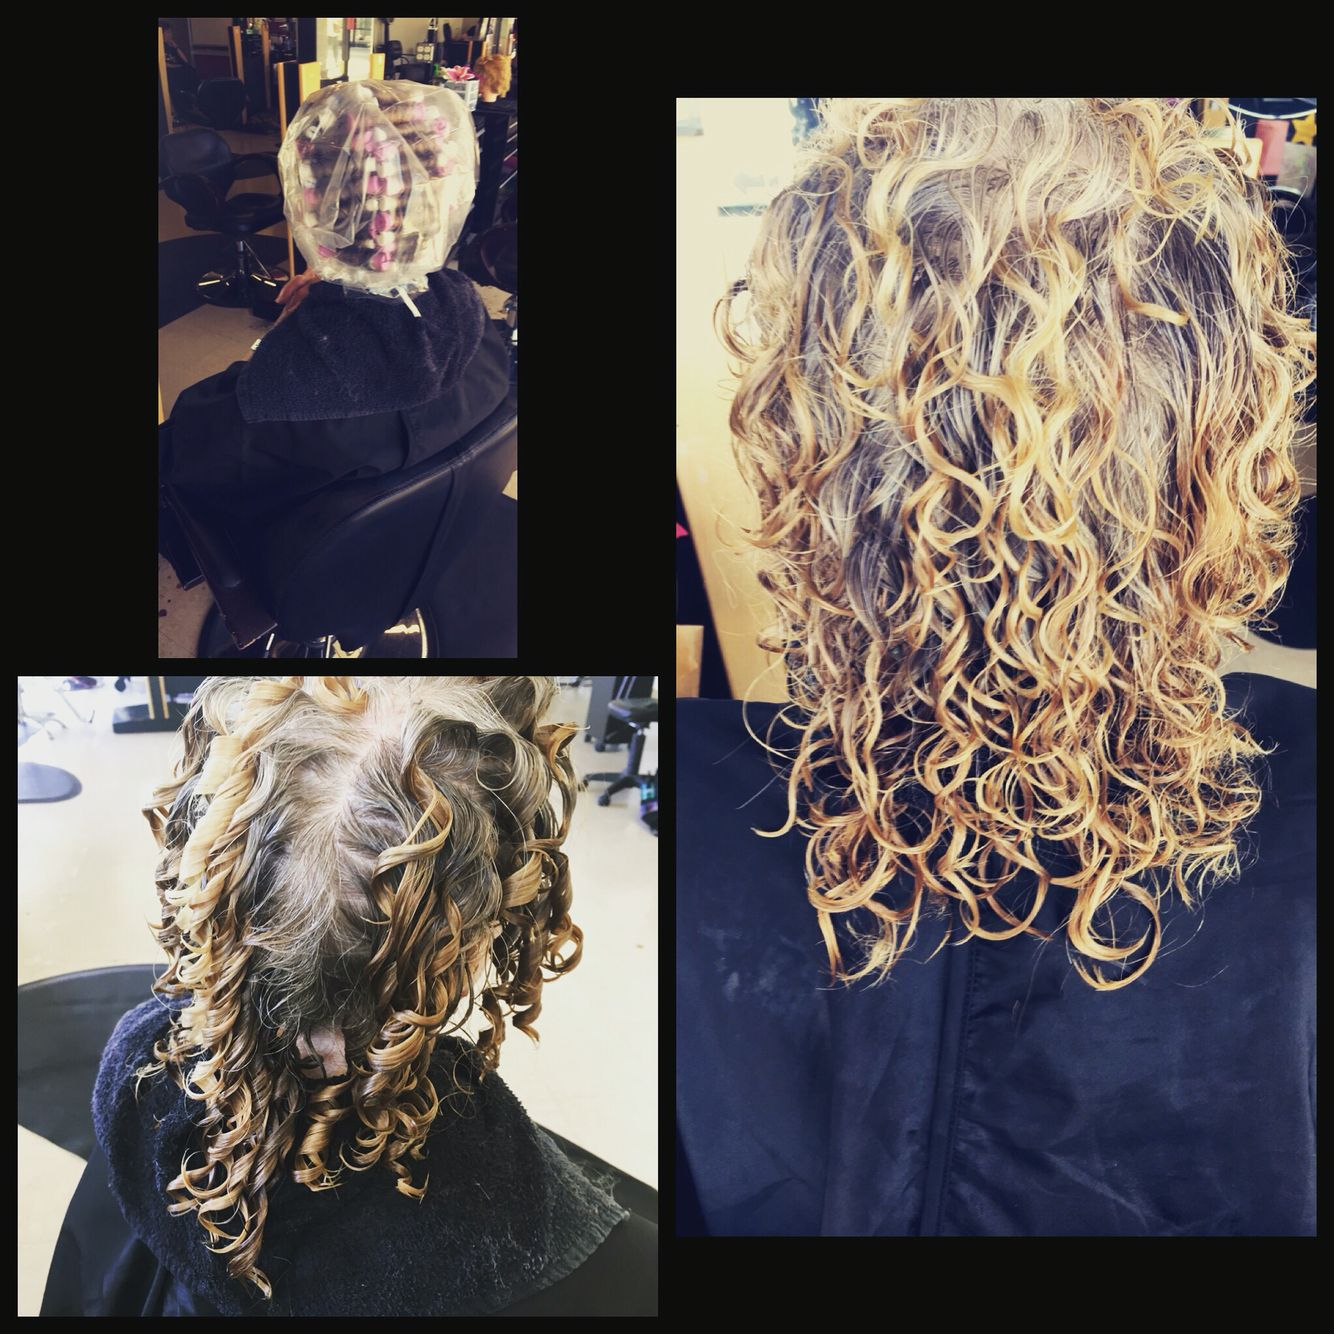 Perms For Medium Length Hair Spiral Perm Hairstyles On Medium Length Hair Pictures Gallery Exam Permed Hairstyles Medium Length Hair Styles Short Permed Hair